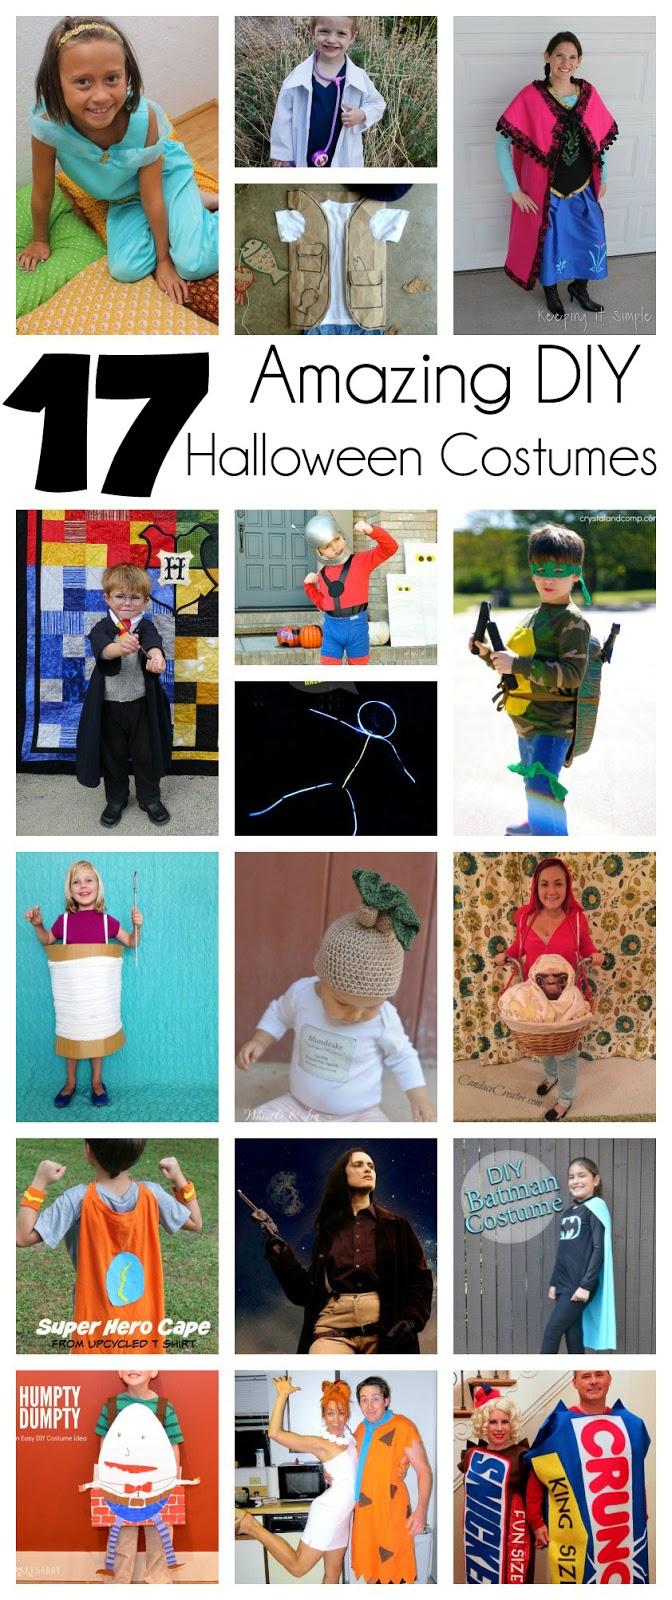 http://makingtheworldcuter.com/wp-content/uploads/2015/10/DIY-Costumes-2.jpg